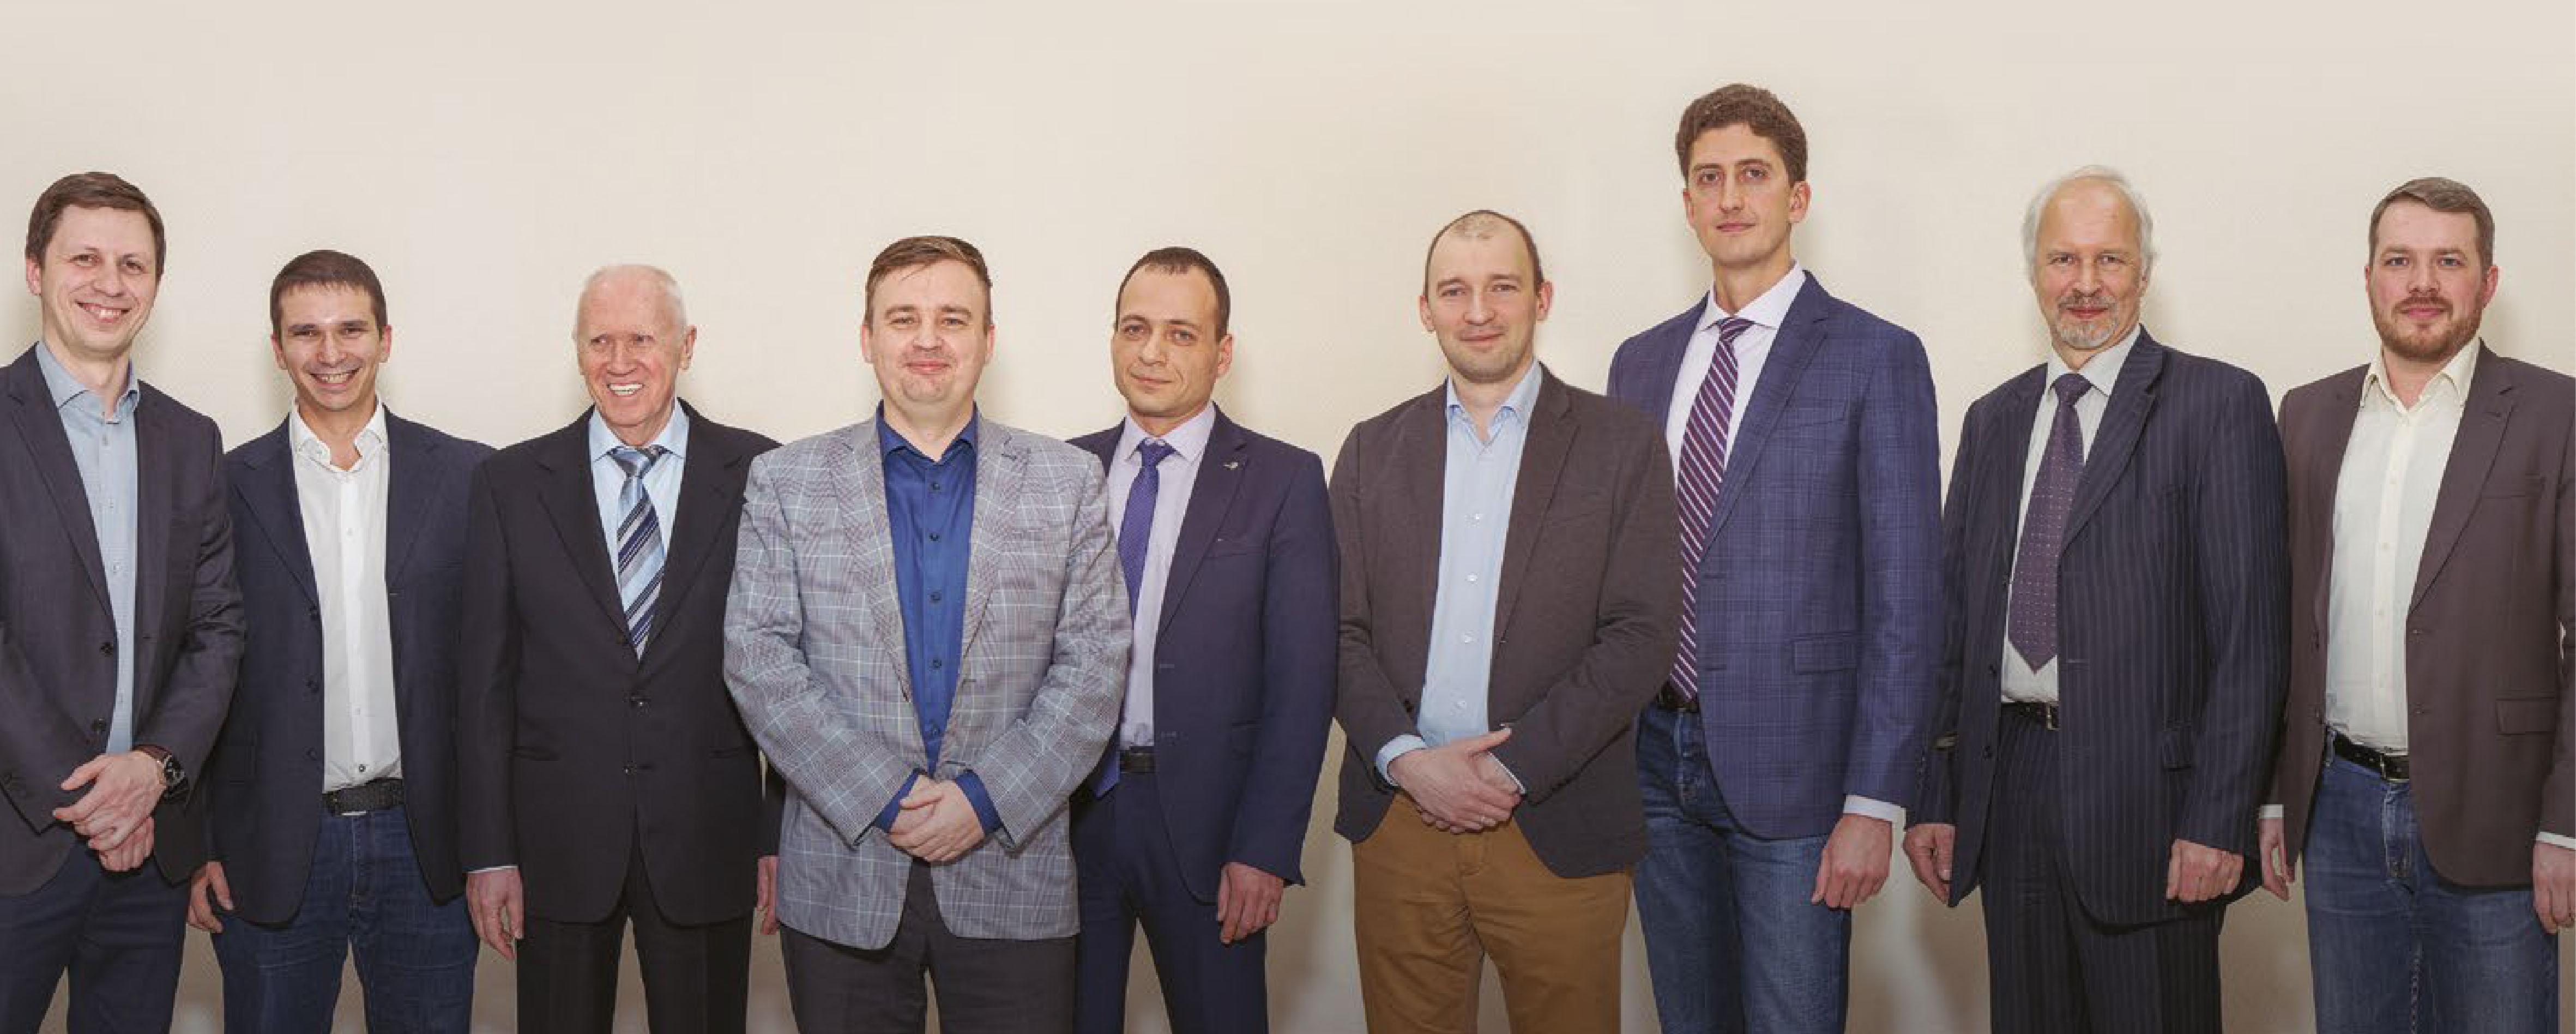 Команда проекта Прорыв